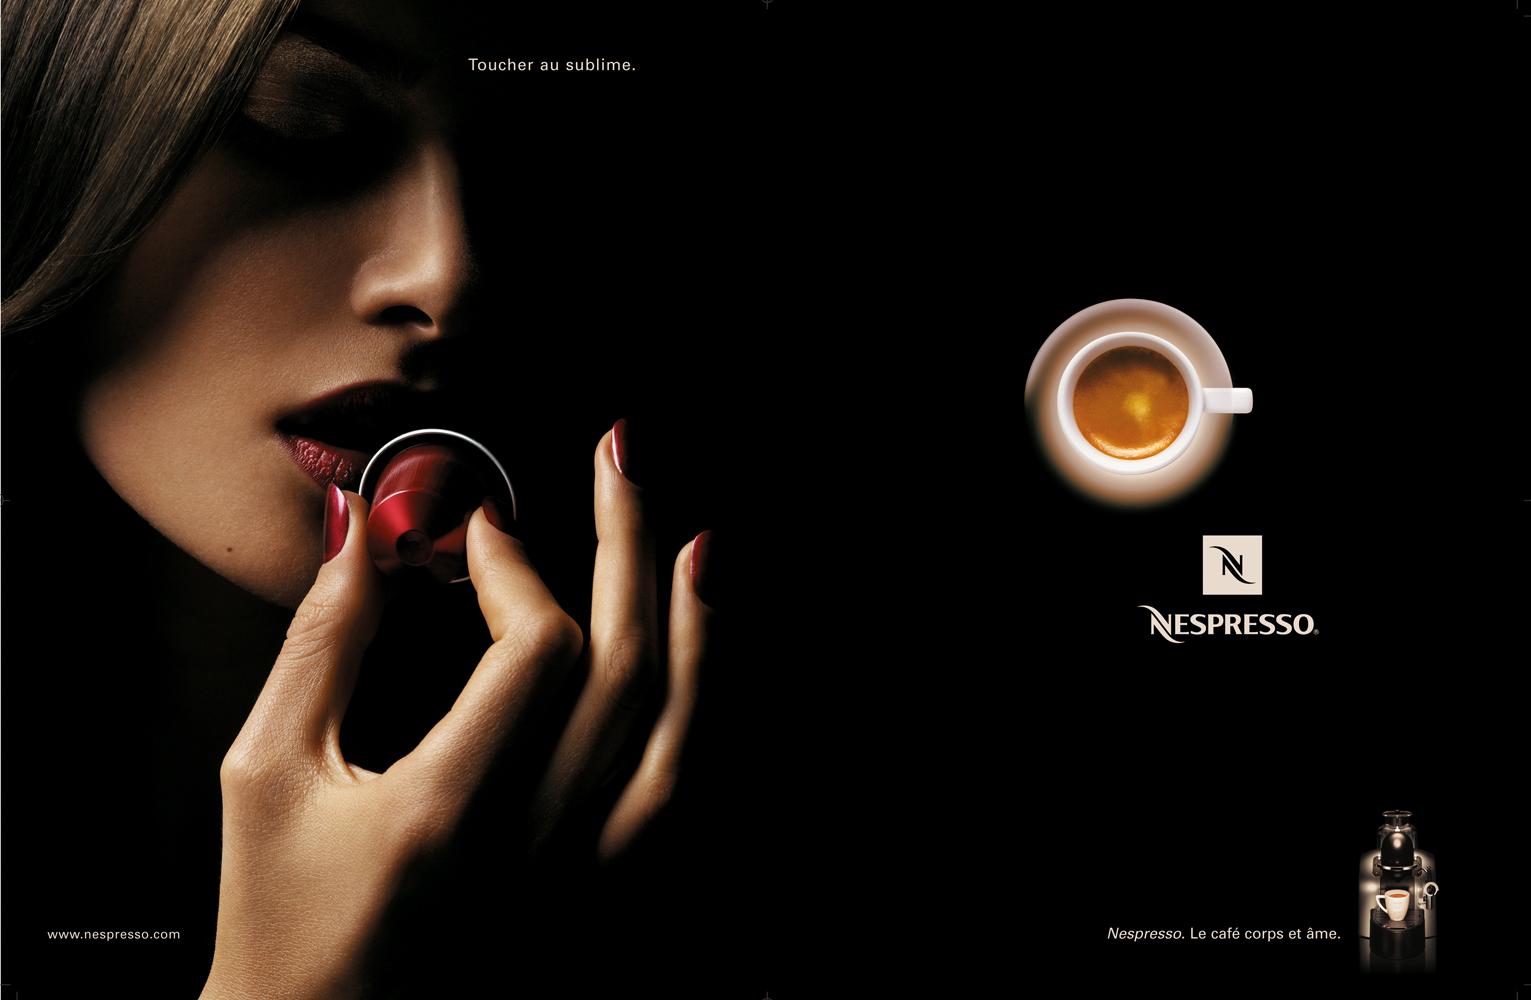 nespresso_bouche.jpg